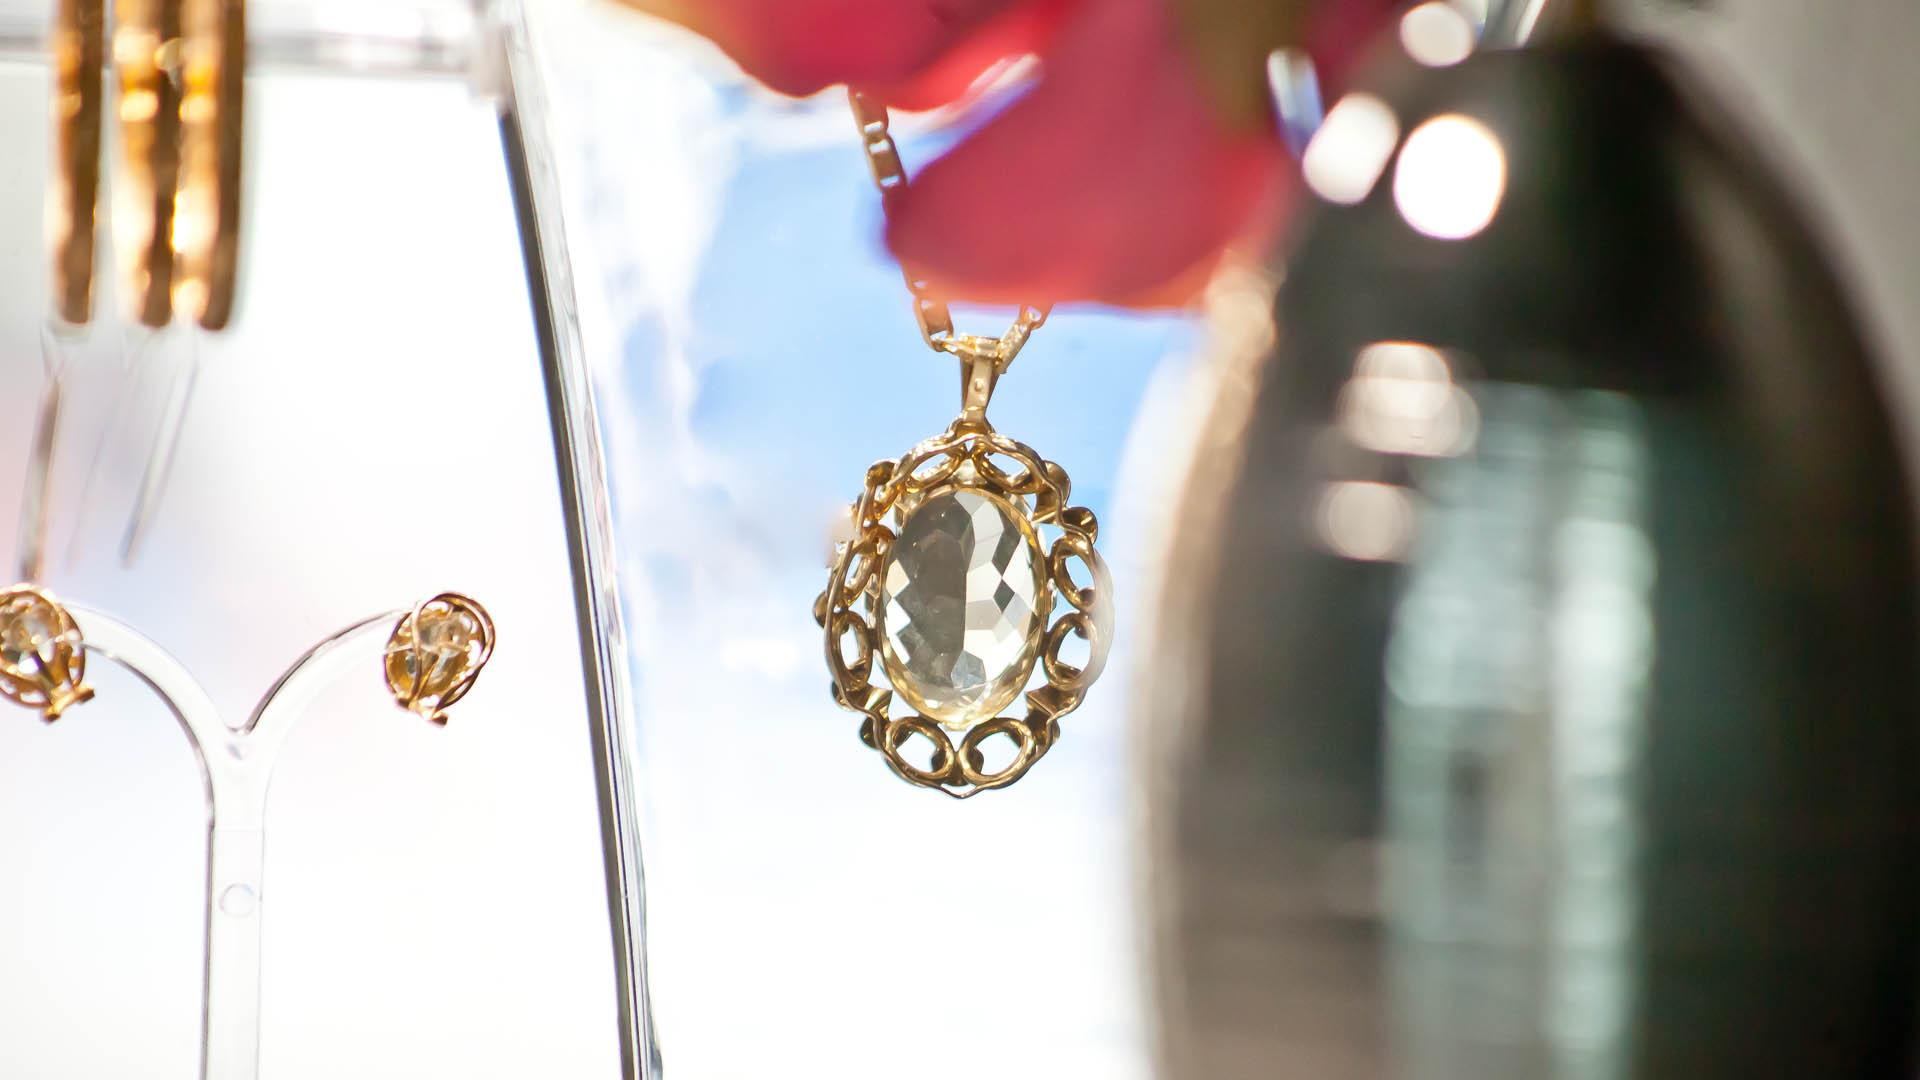 Juwelier Käfer Hauptbahnhof Anhänger mit Kette